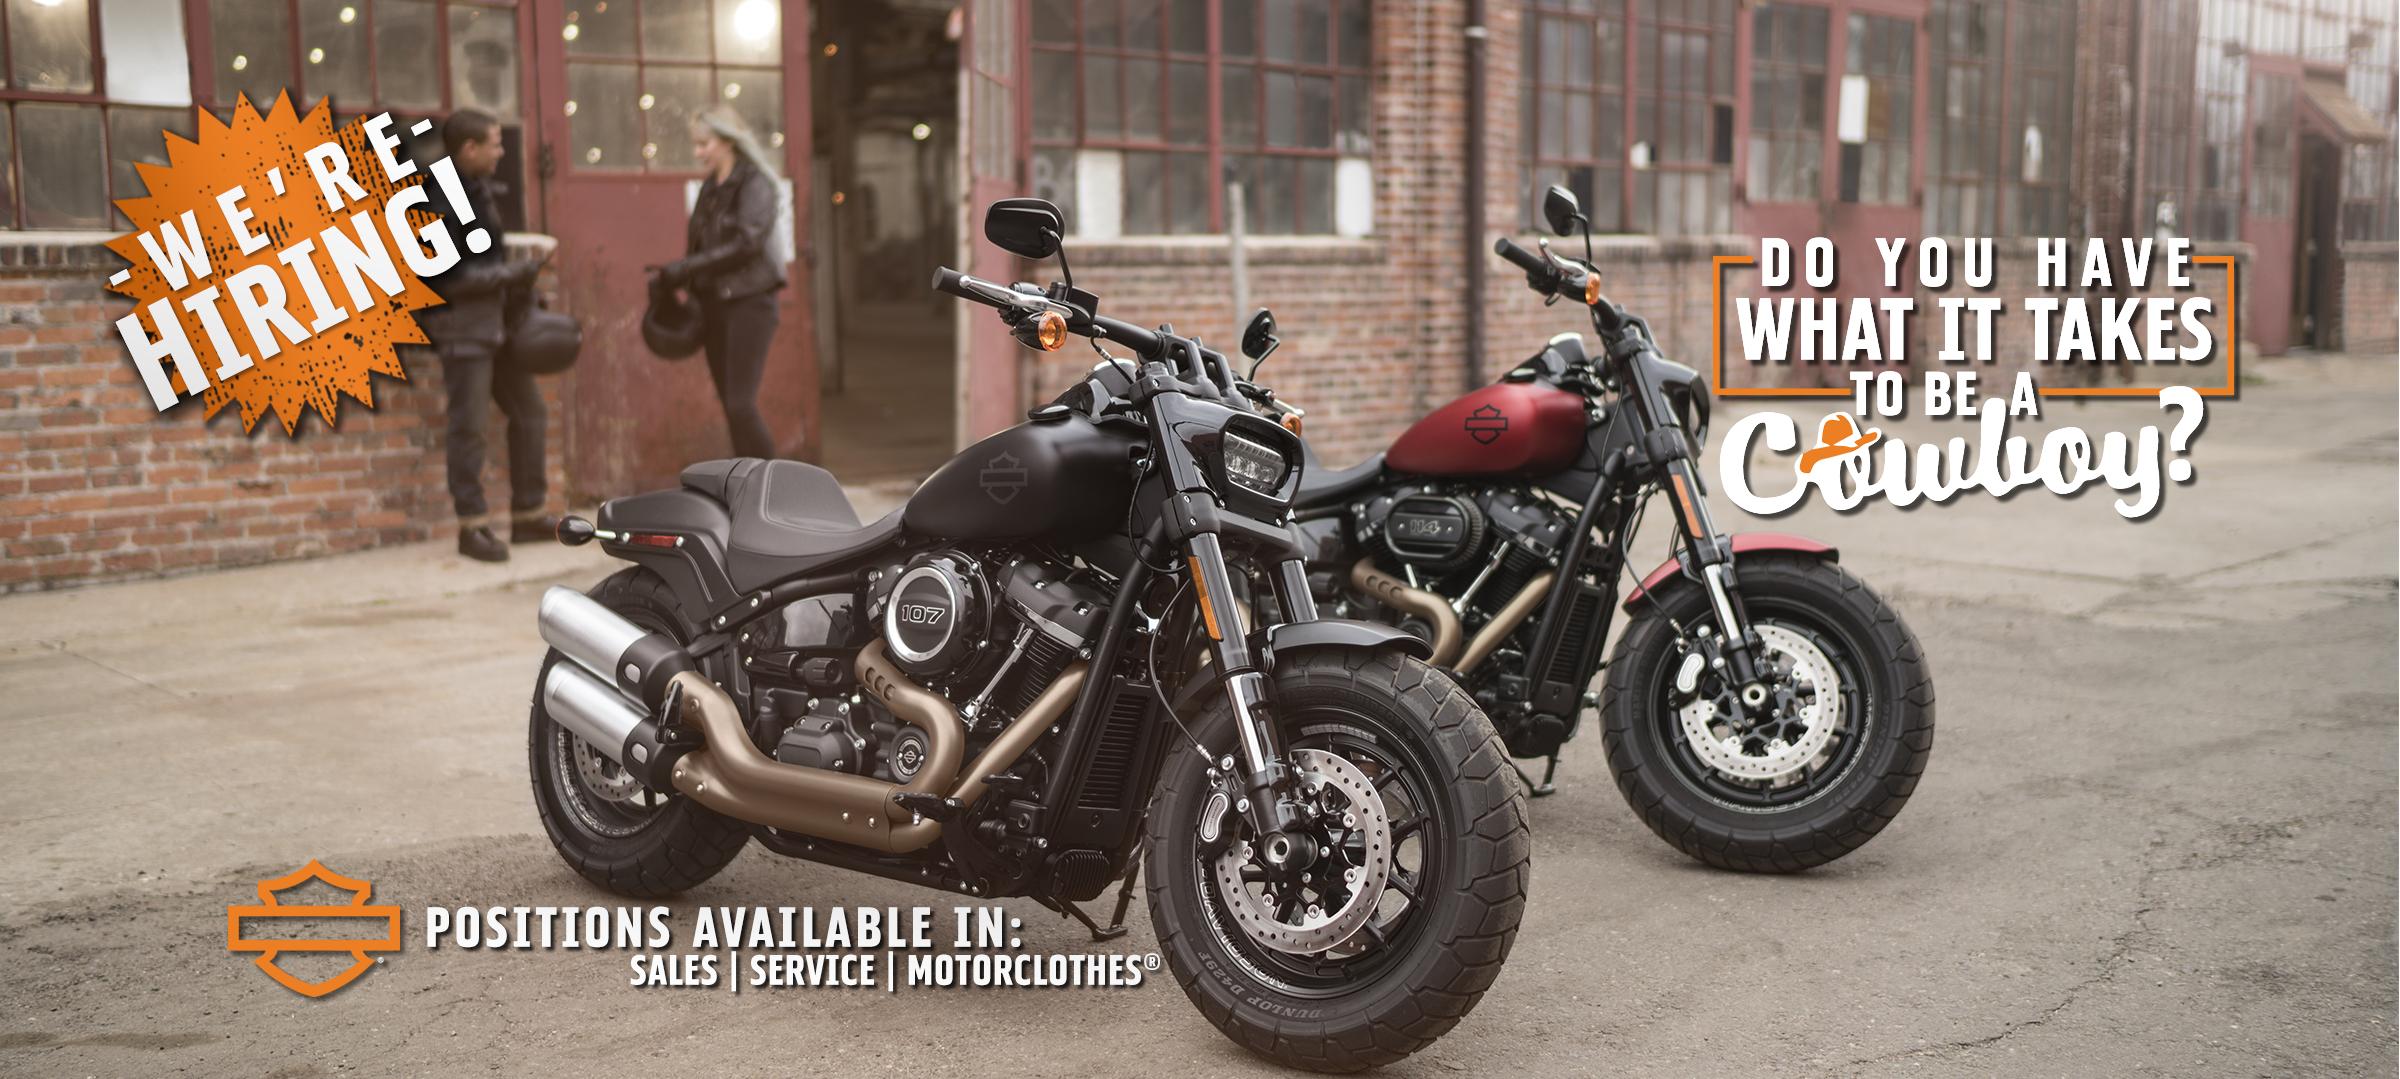 Cowboy Harley Davidson Of Austin 2014 Tri Glide Trailer Wiring Harness Im Your Person